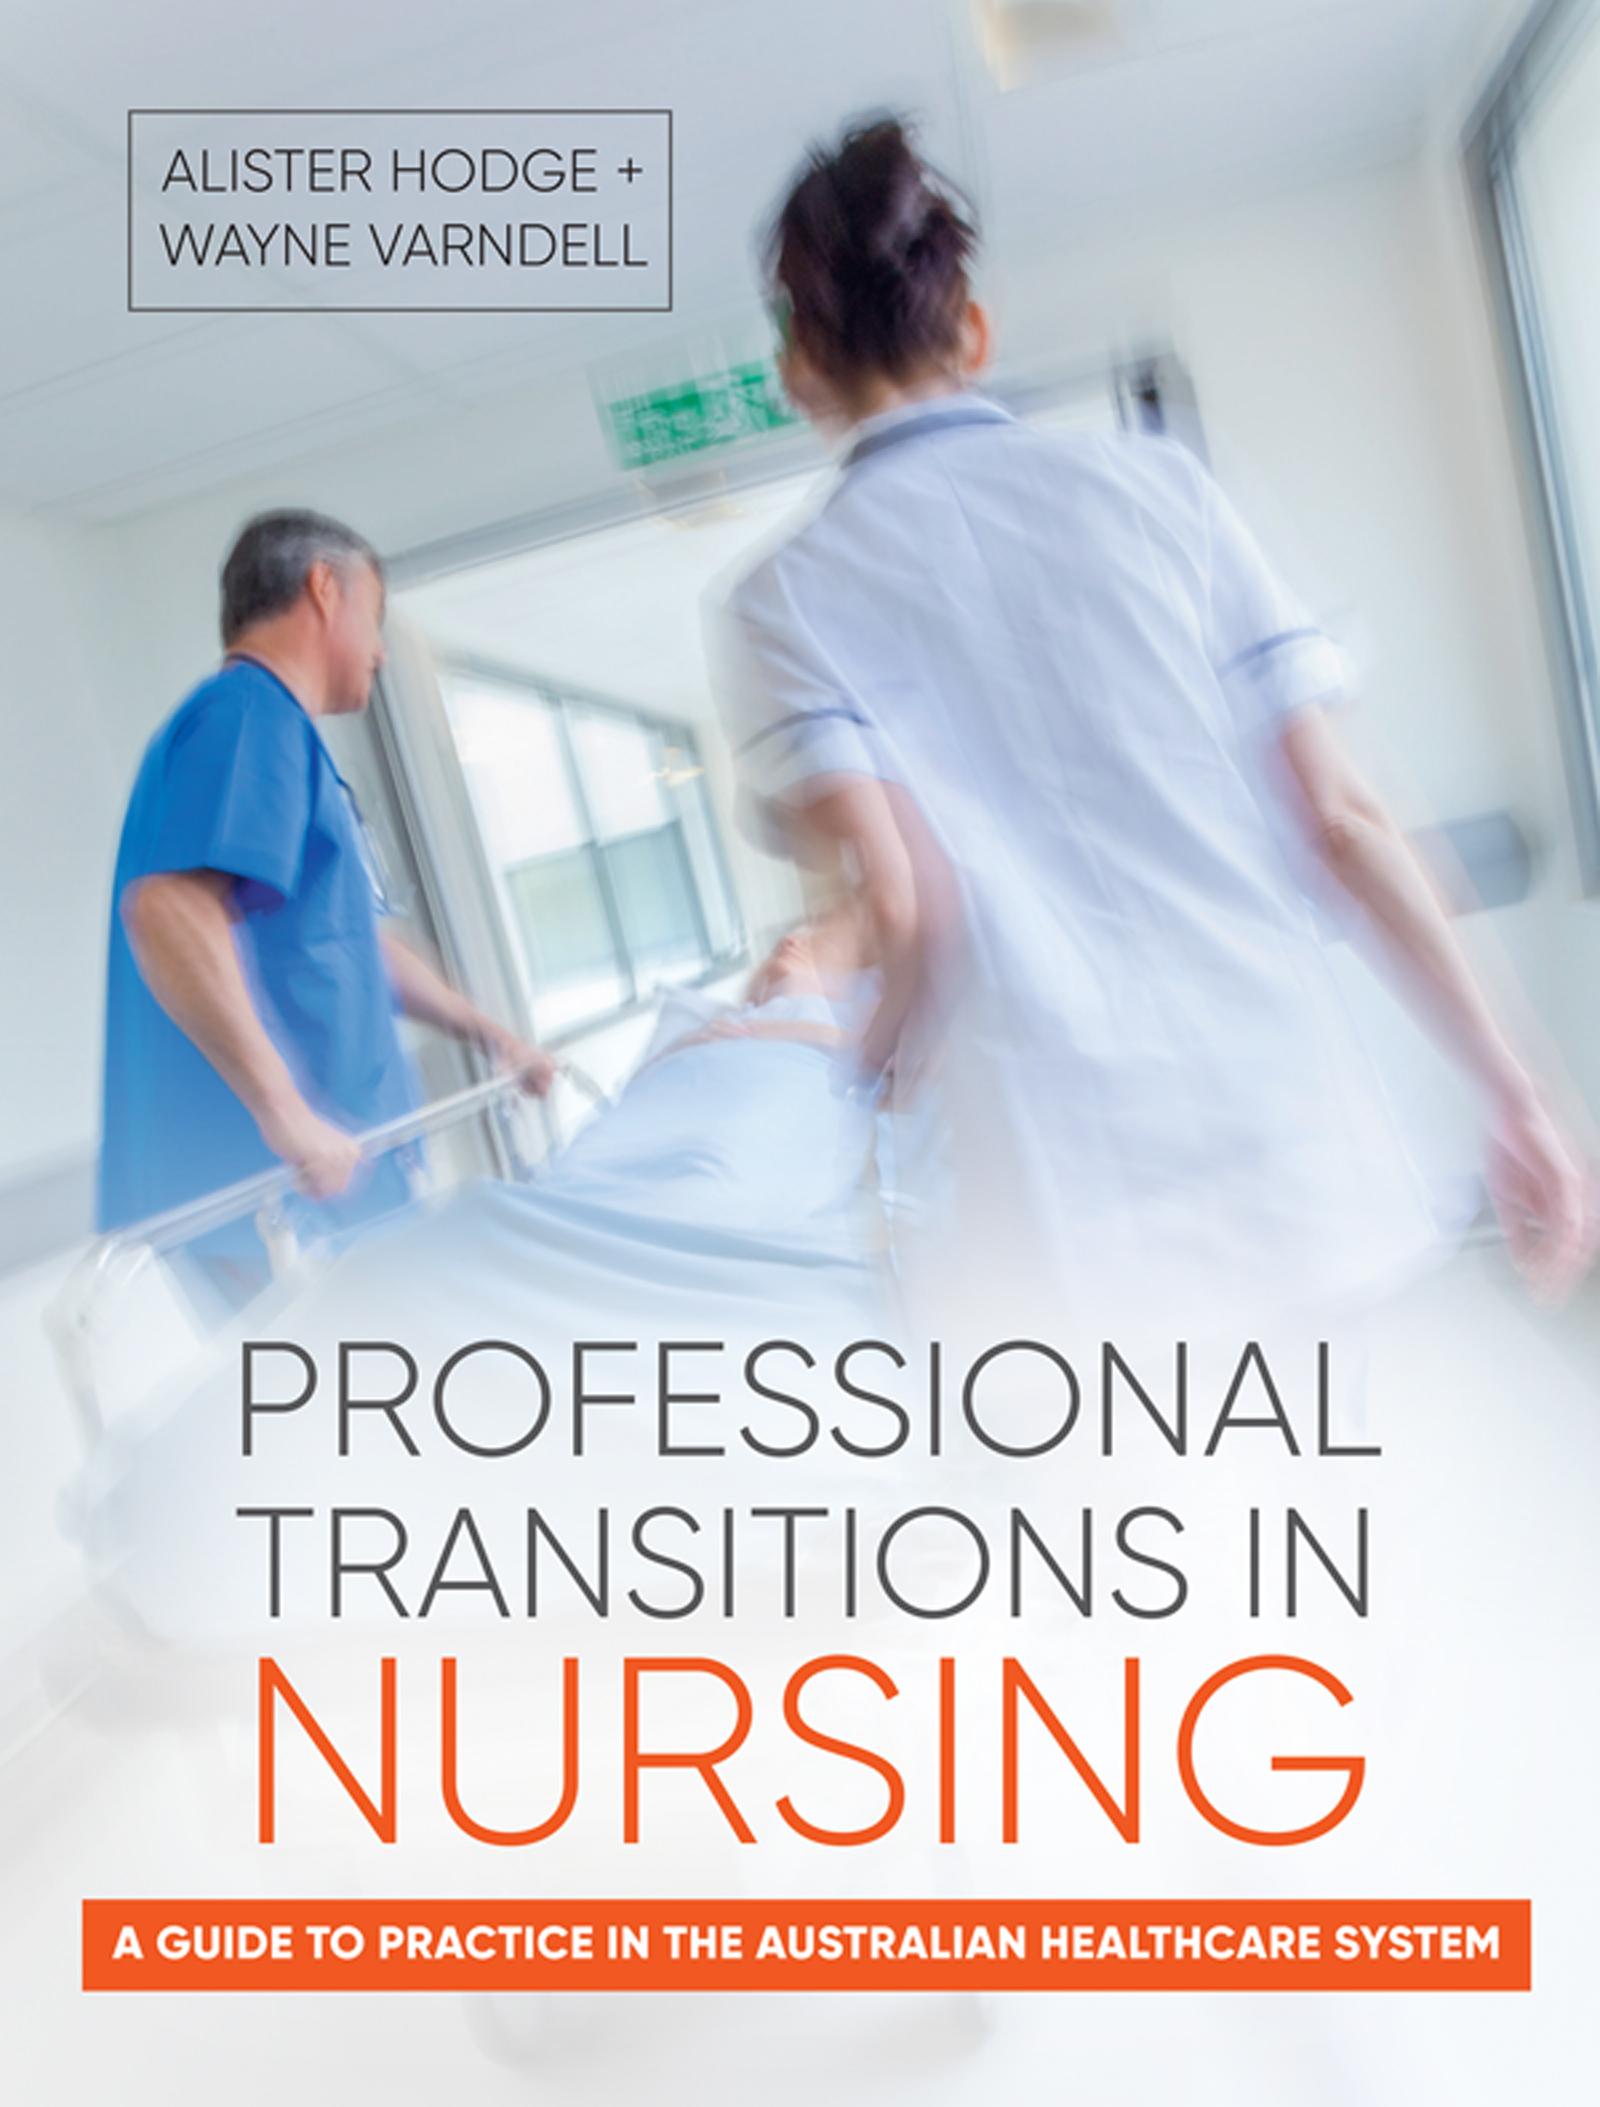 Professional Transitions in Nursing